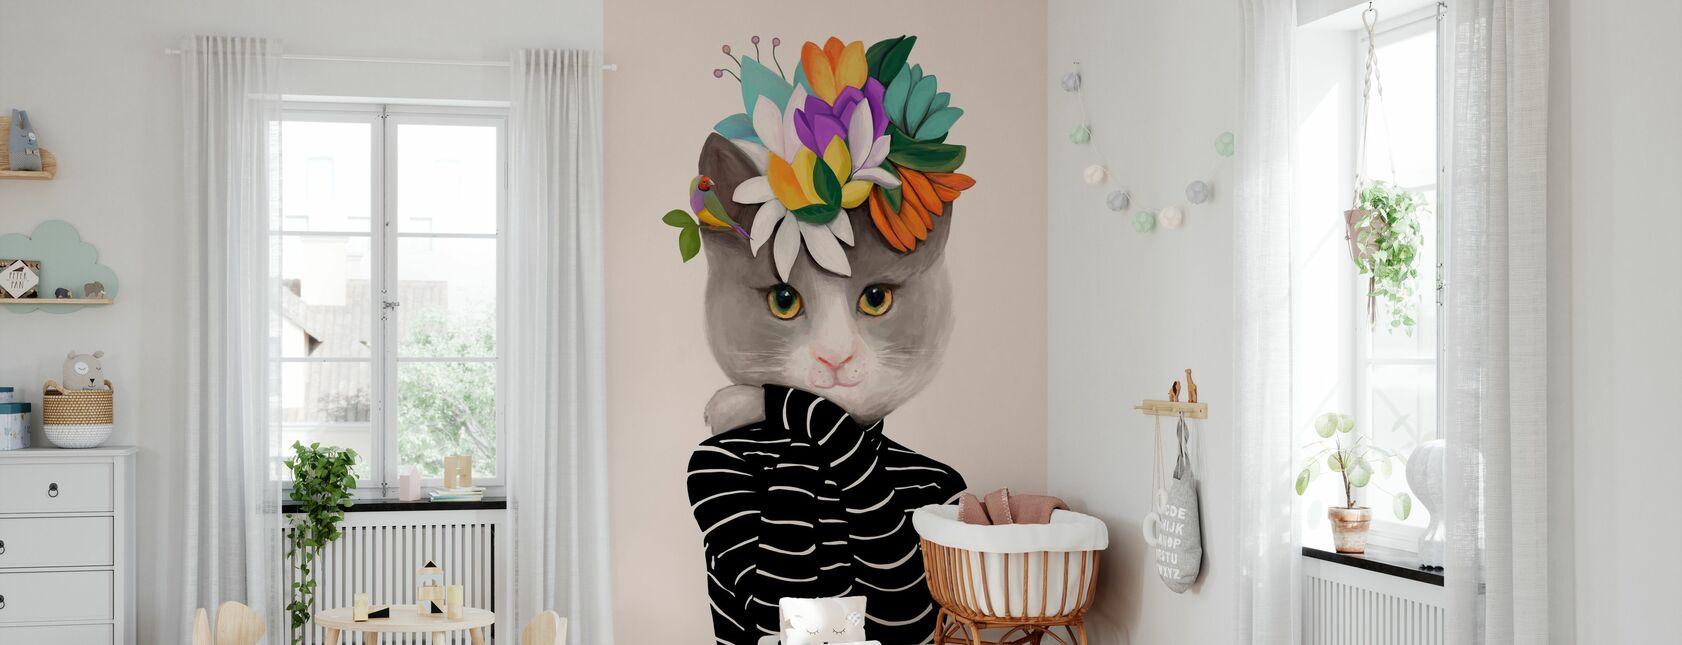 Katt - Tapet - Babyrom